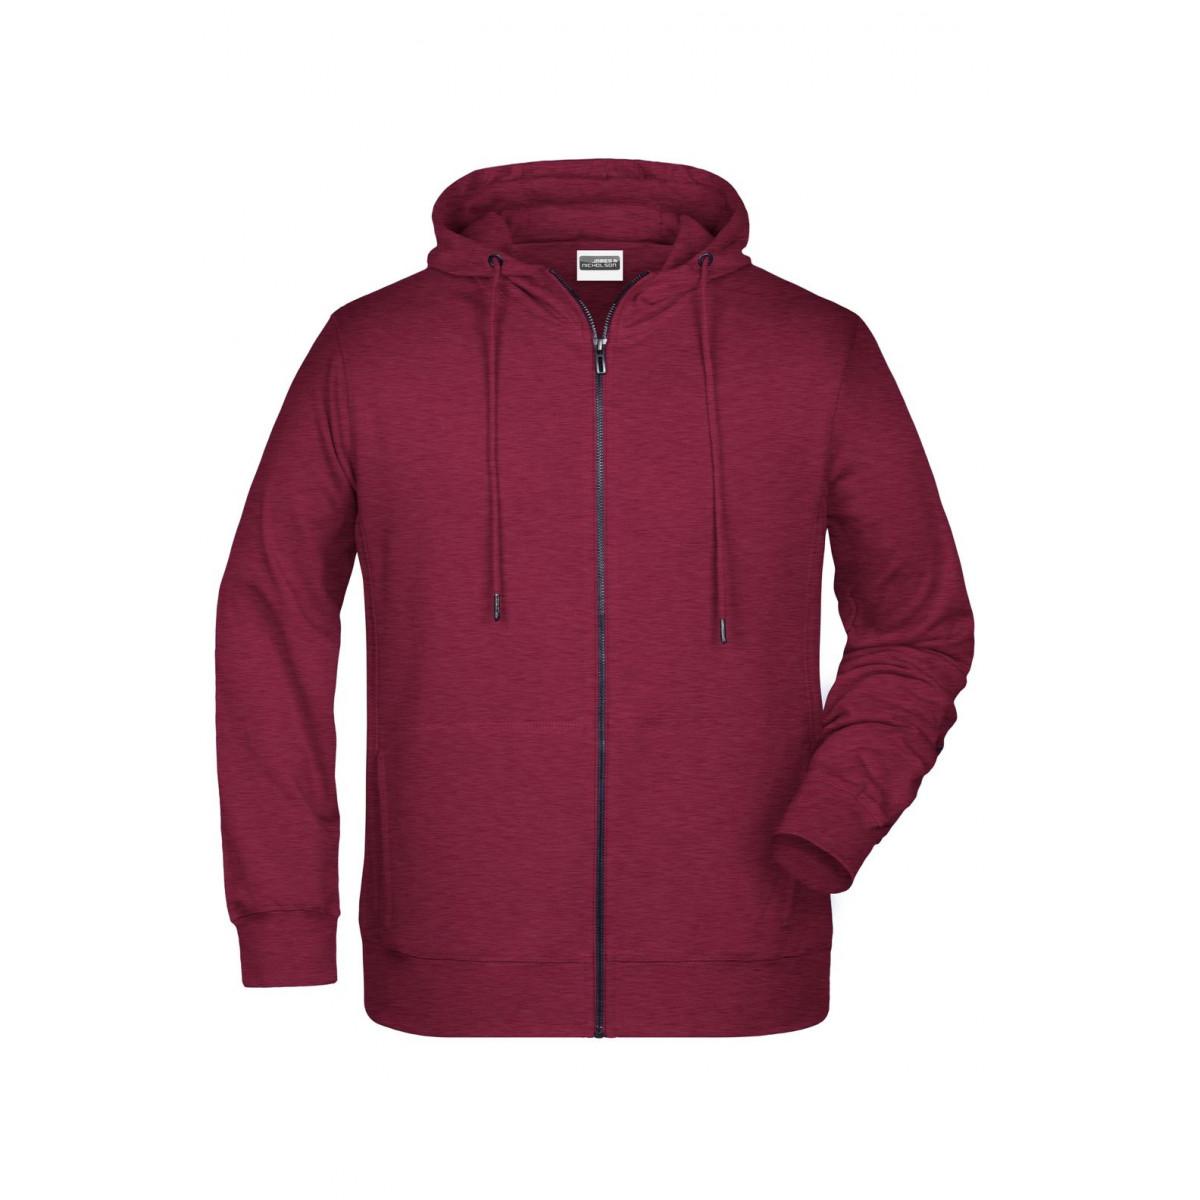 Толстовка мужская 8026 Mens Zip Hoody - Бордовый меланж